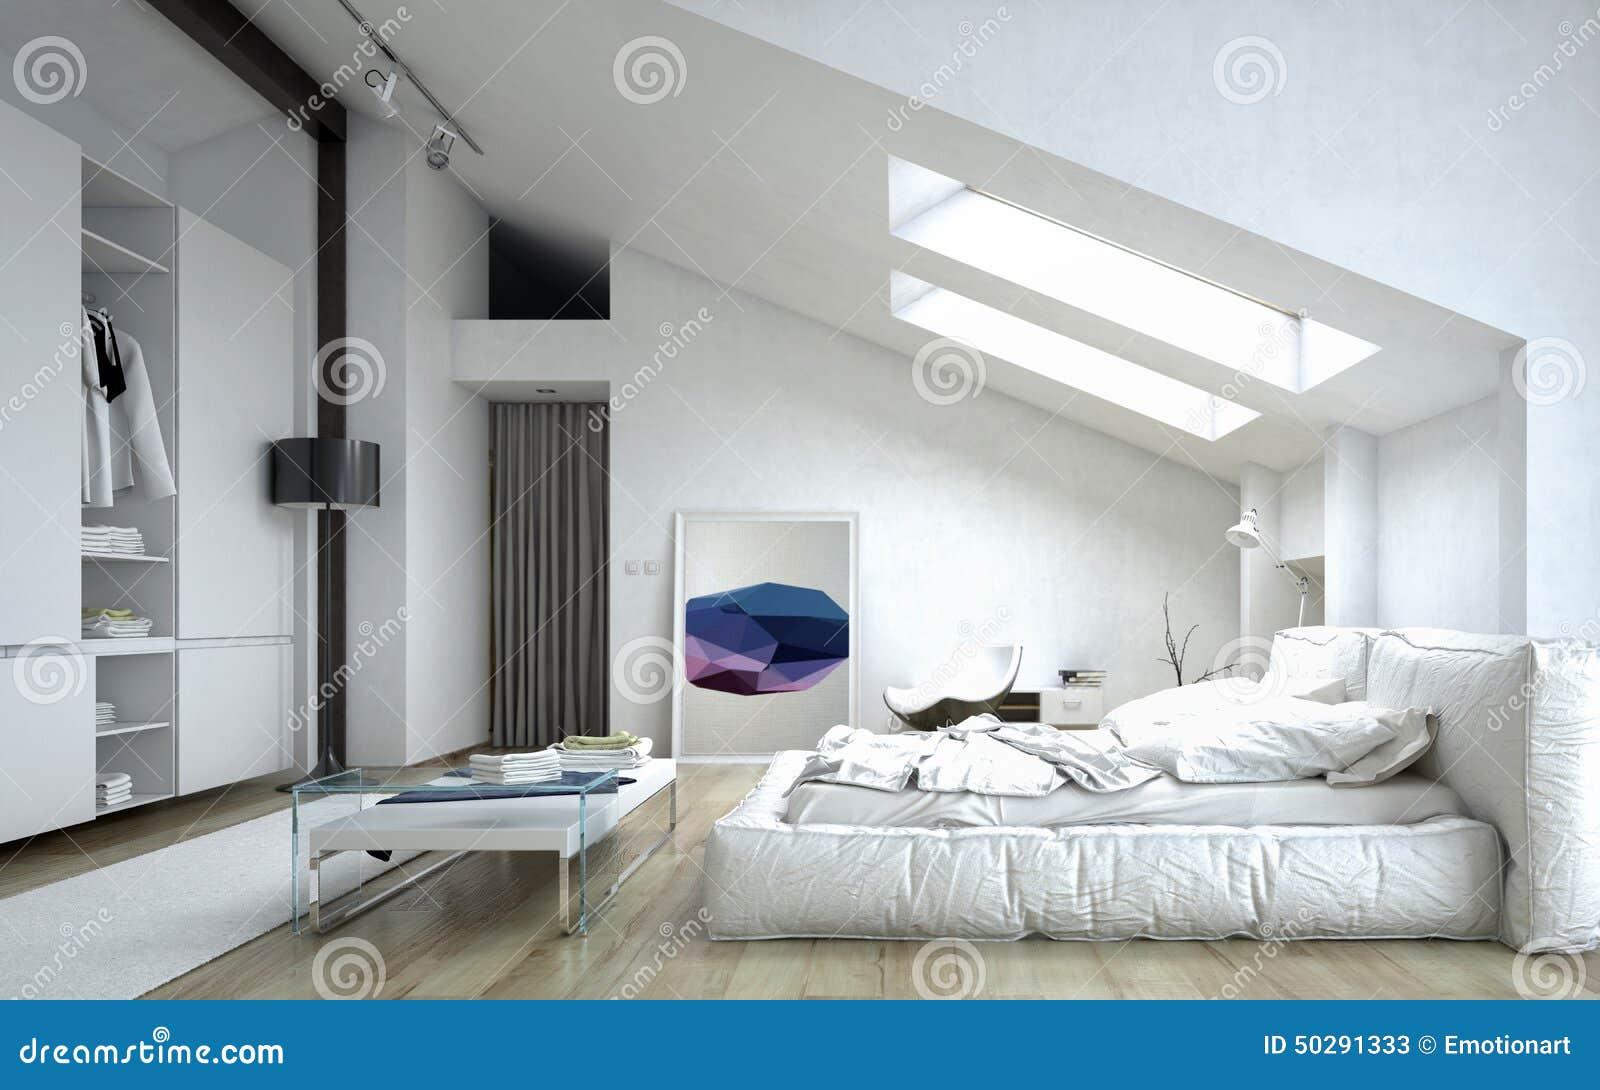 Architecturale slaapkamer binnen wit huis stock illustratie ...